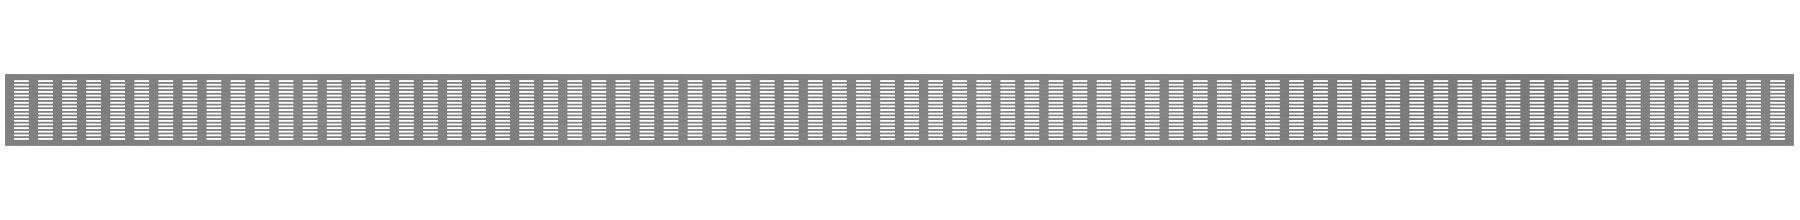 VRS-002C - Ventilaciona rešetka 120×3000 mm